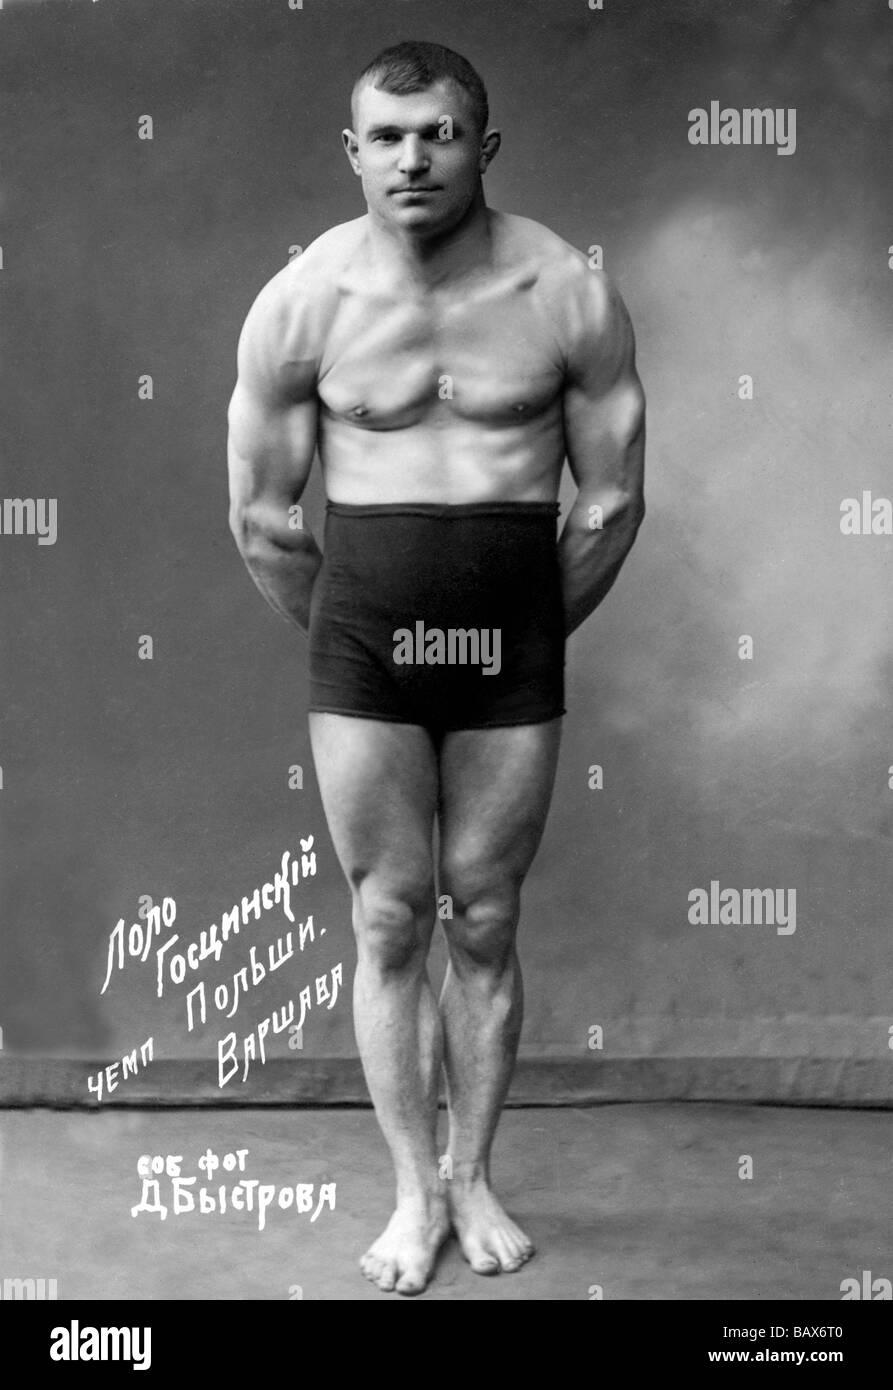 Ivan Poddubny: I am a Russian wrestler. They will stay